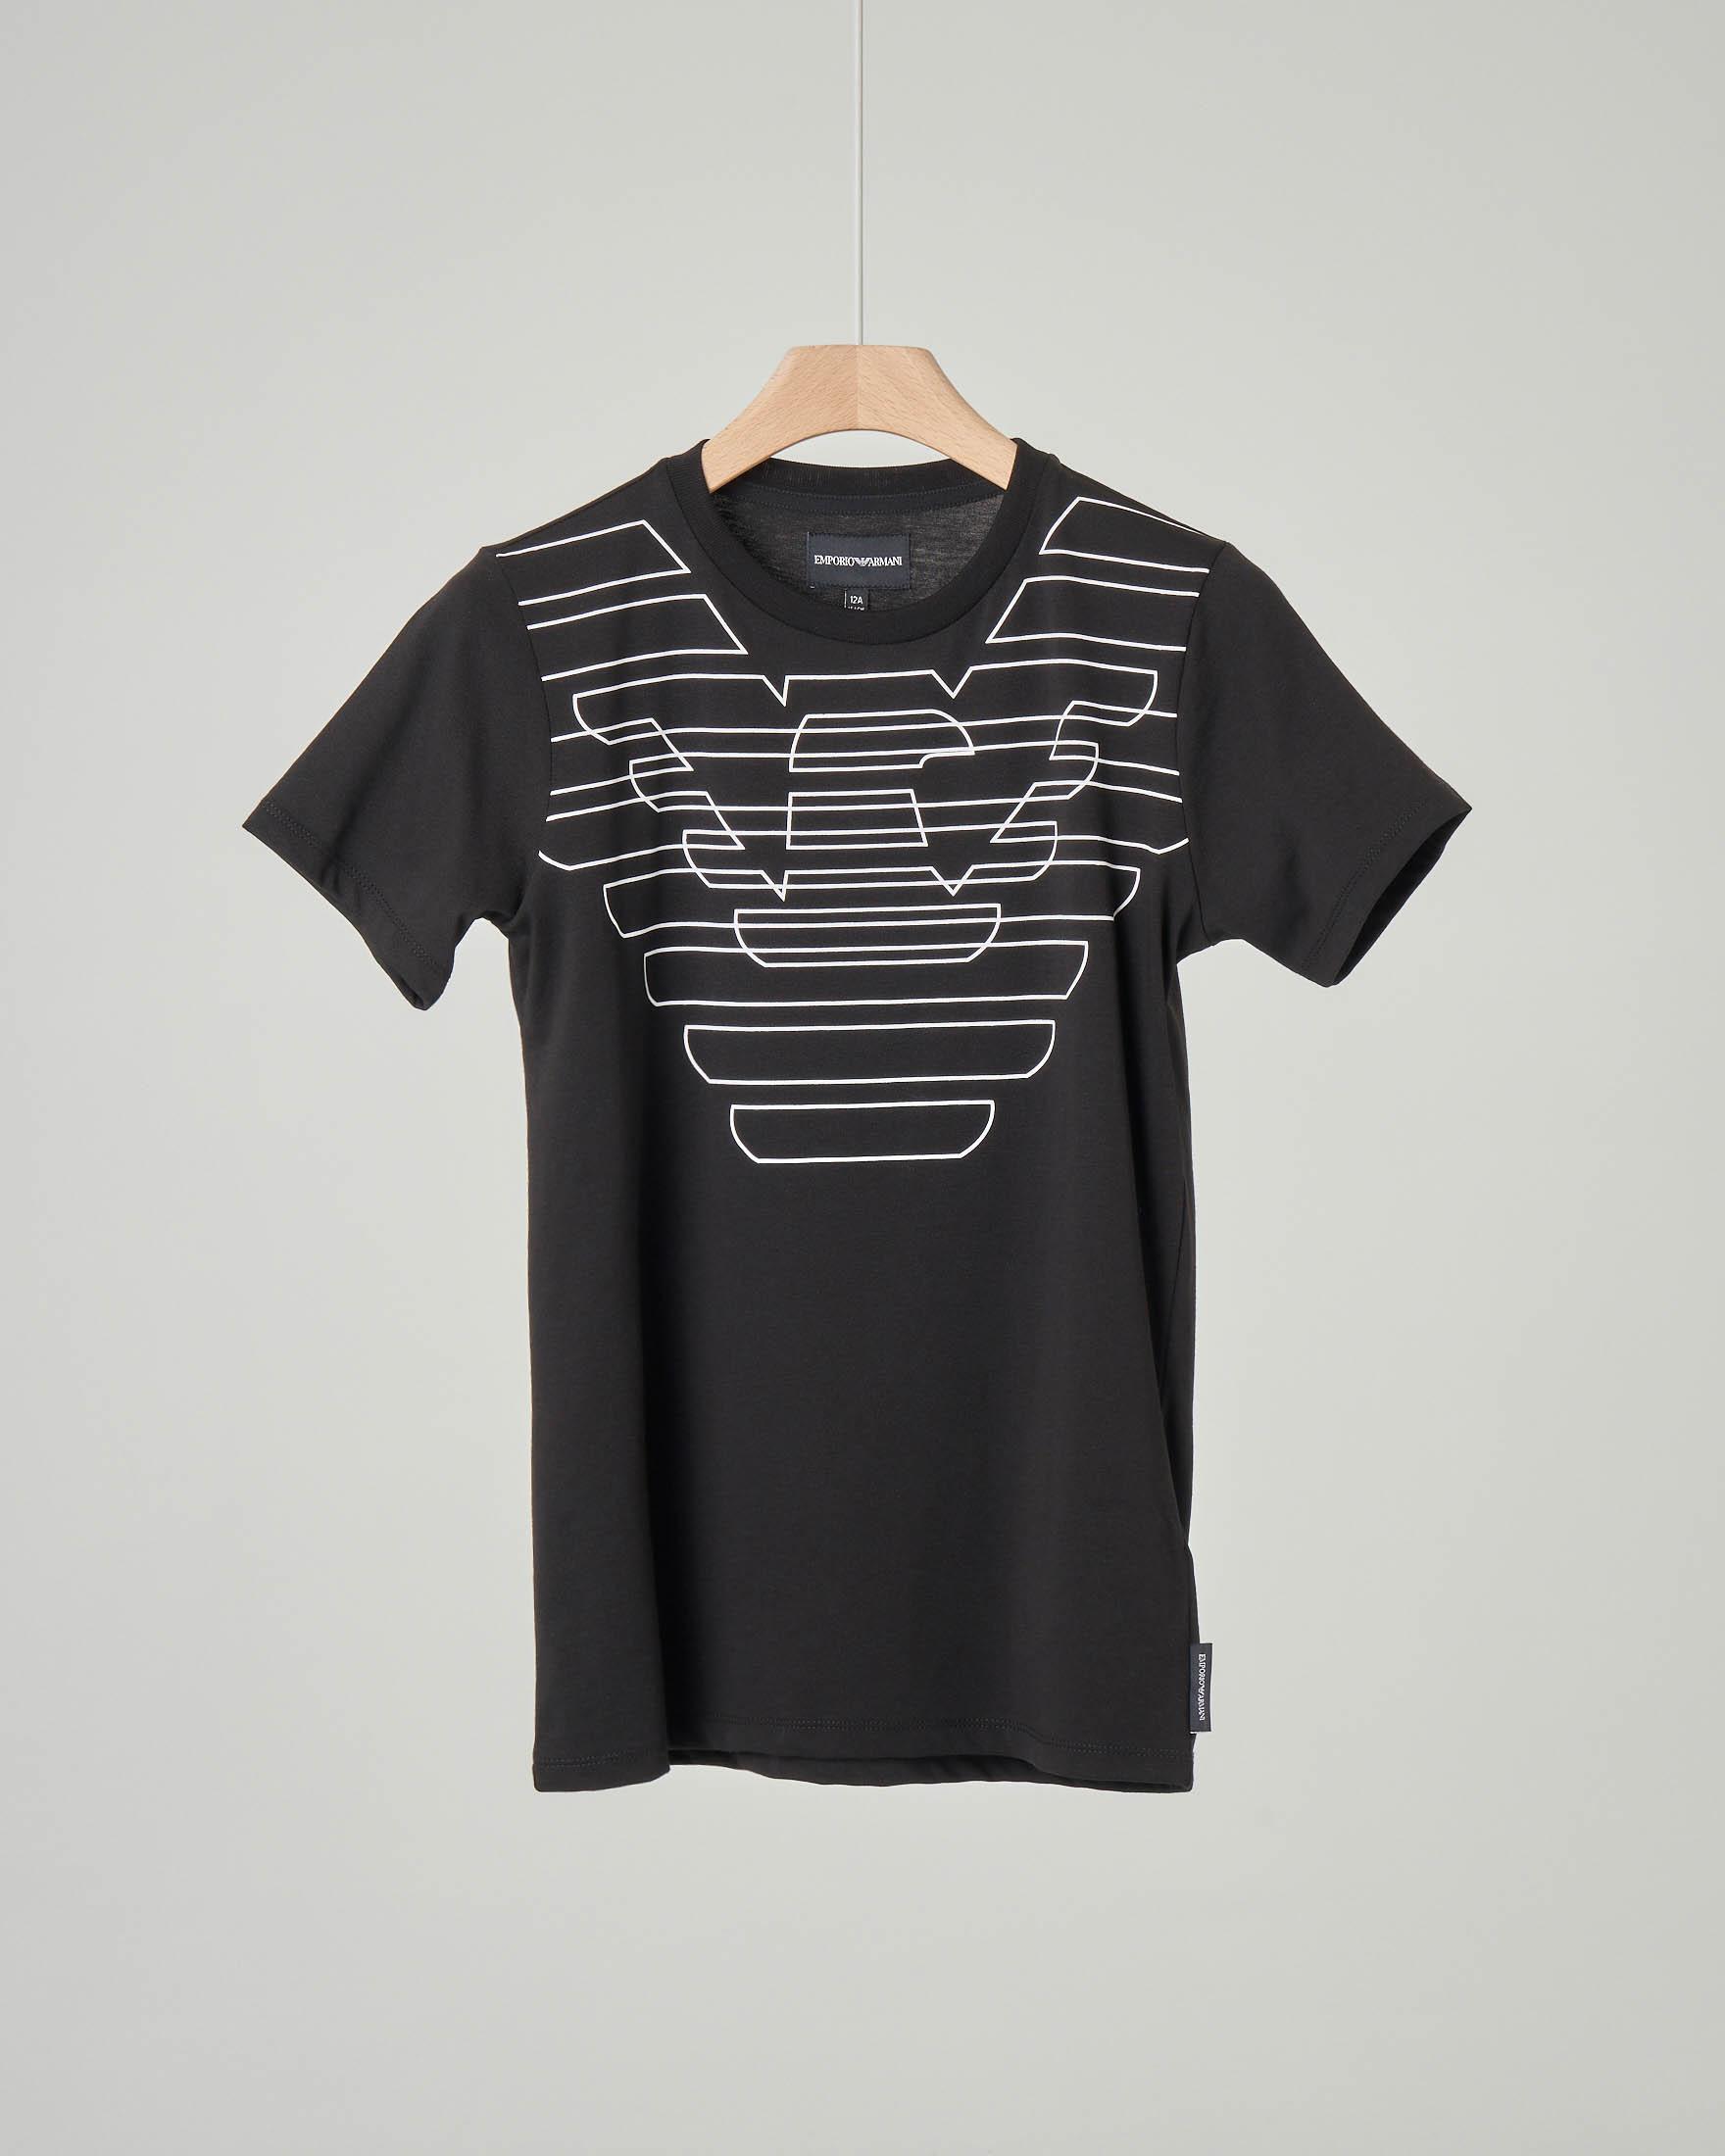 T-shirt nera con maxi-logo aquila